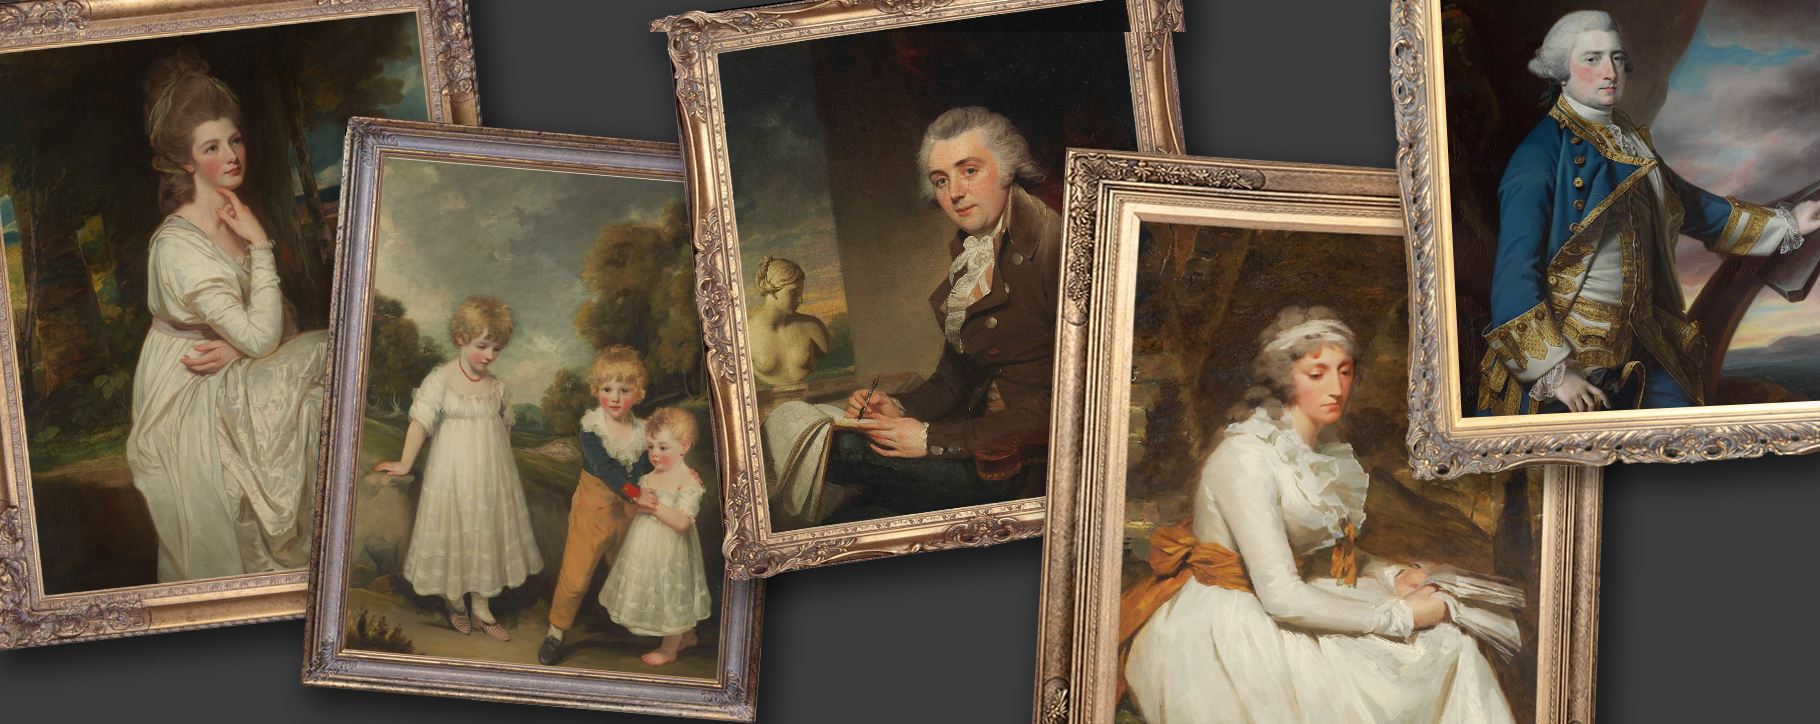 18th century British Portraits